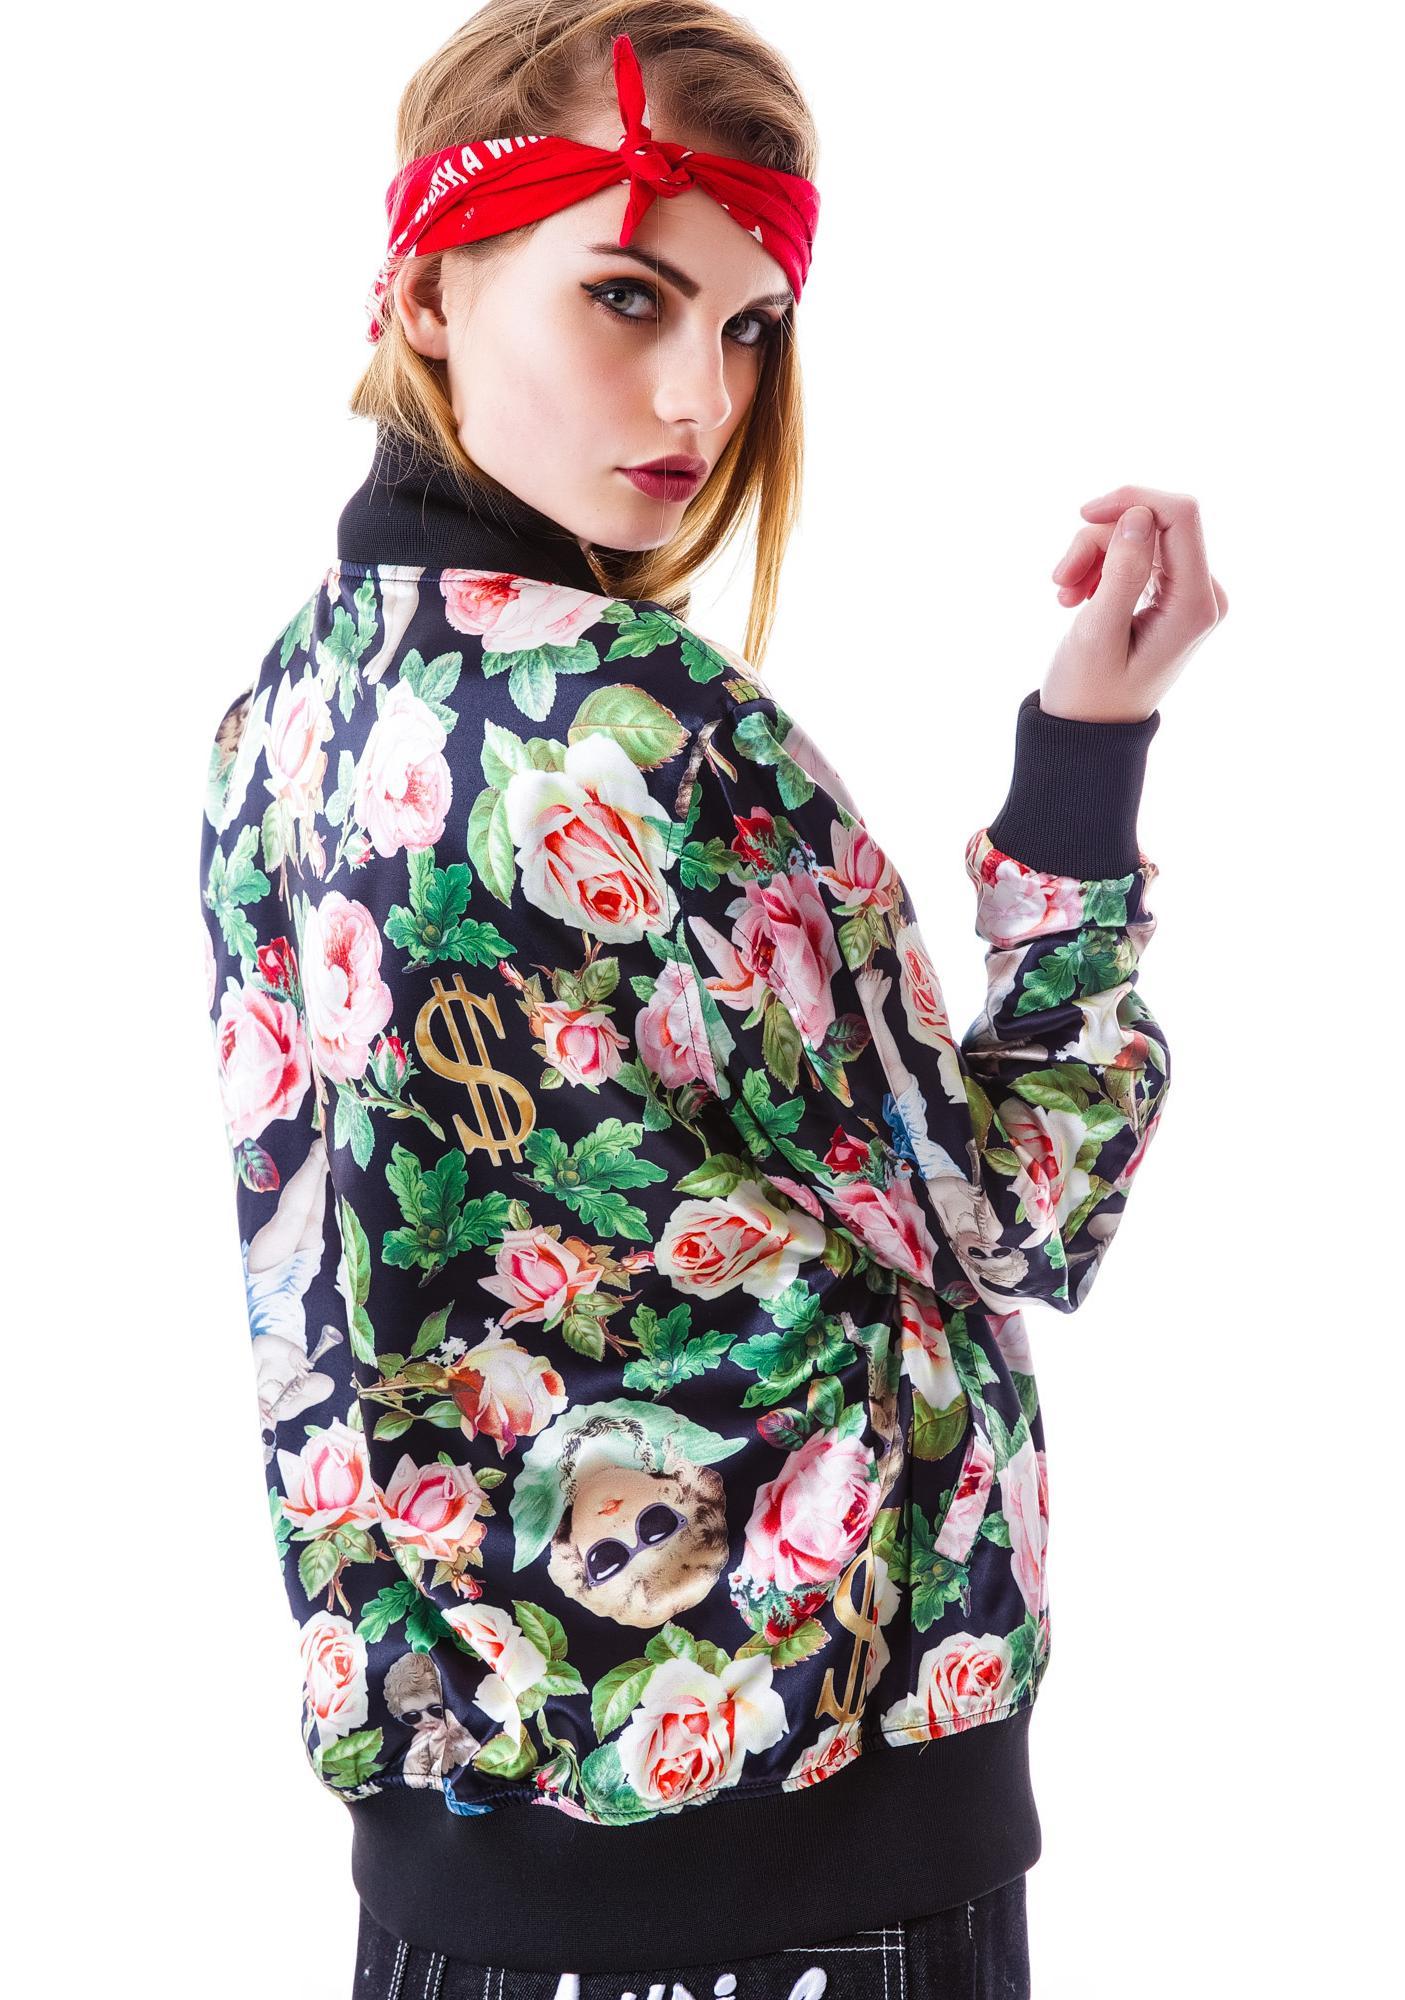 Joyrich Angelic Rich Floral Reverse Jacket